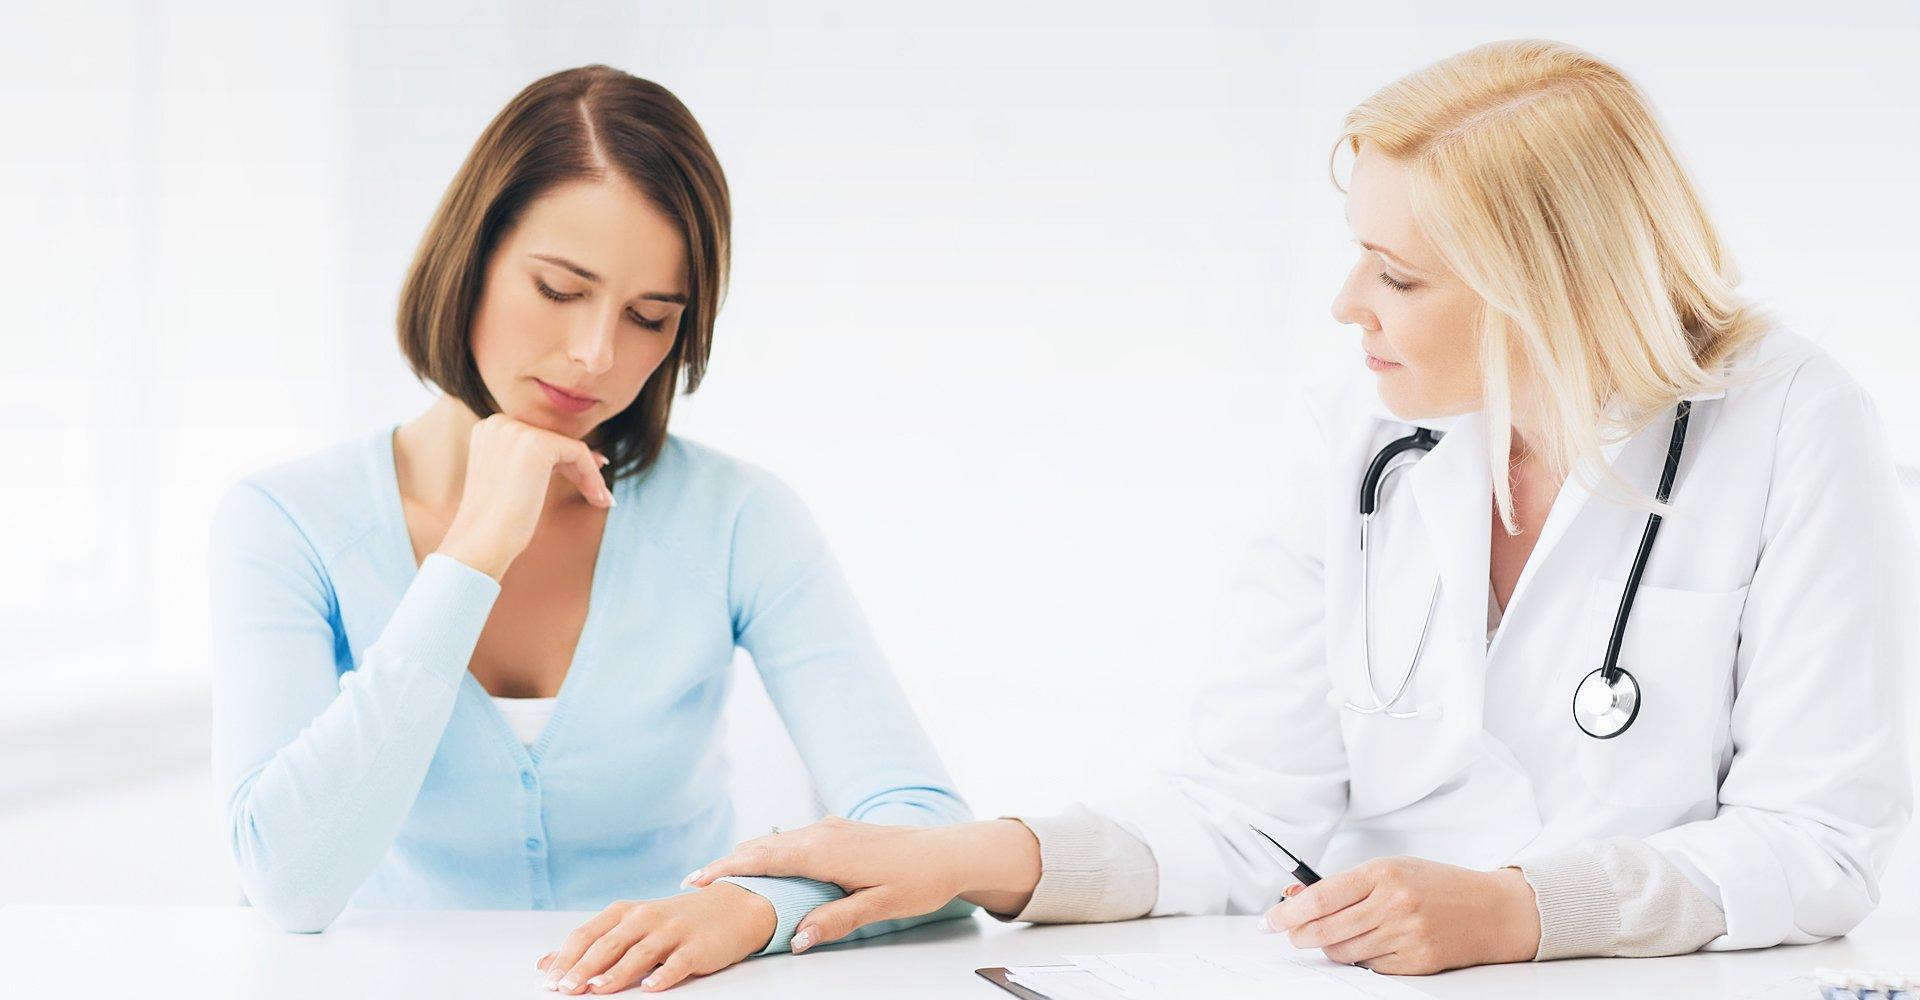 occupational health advice